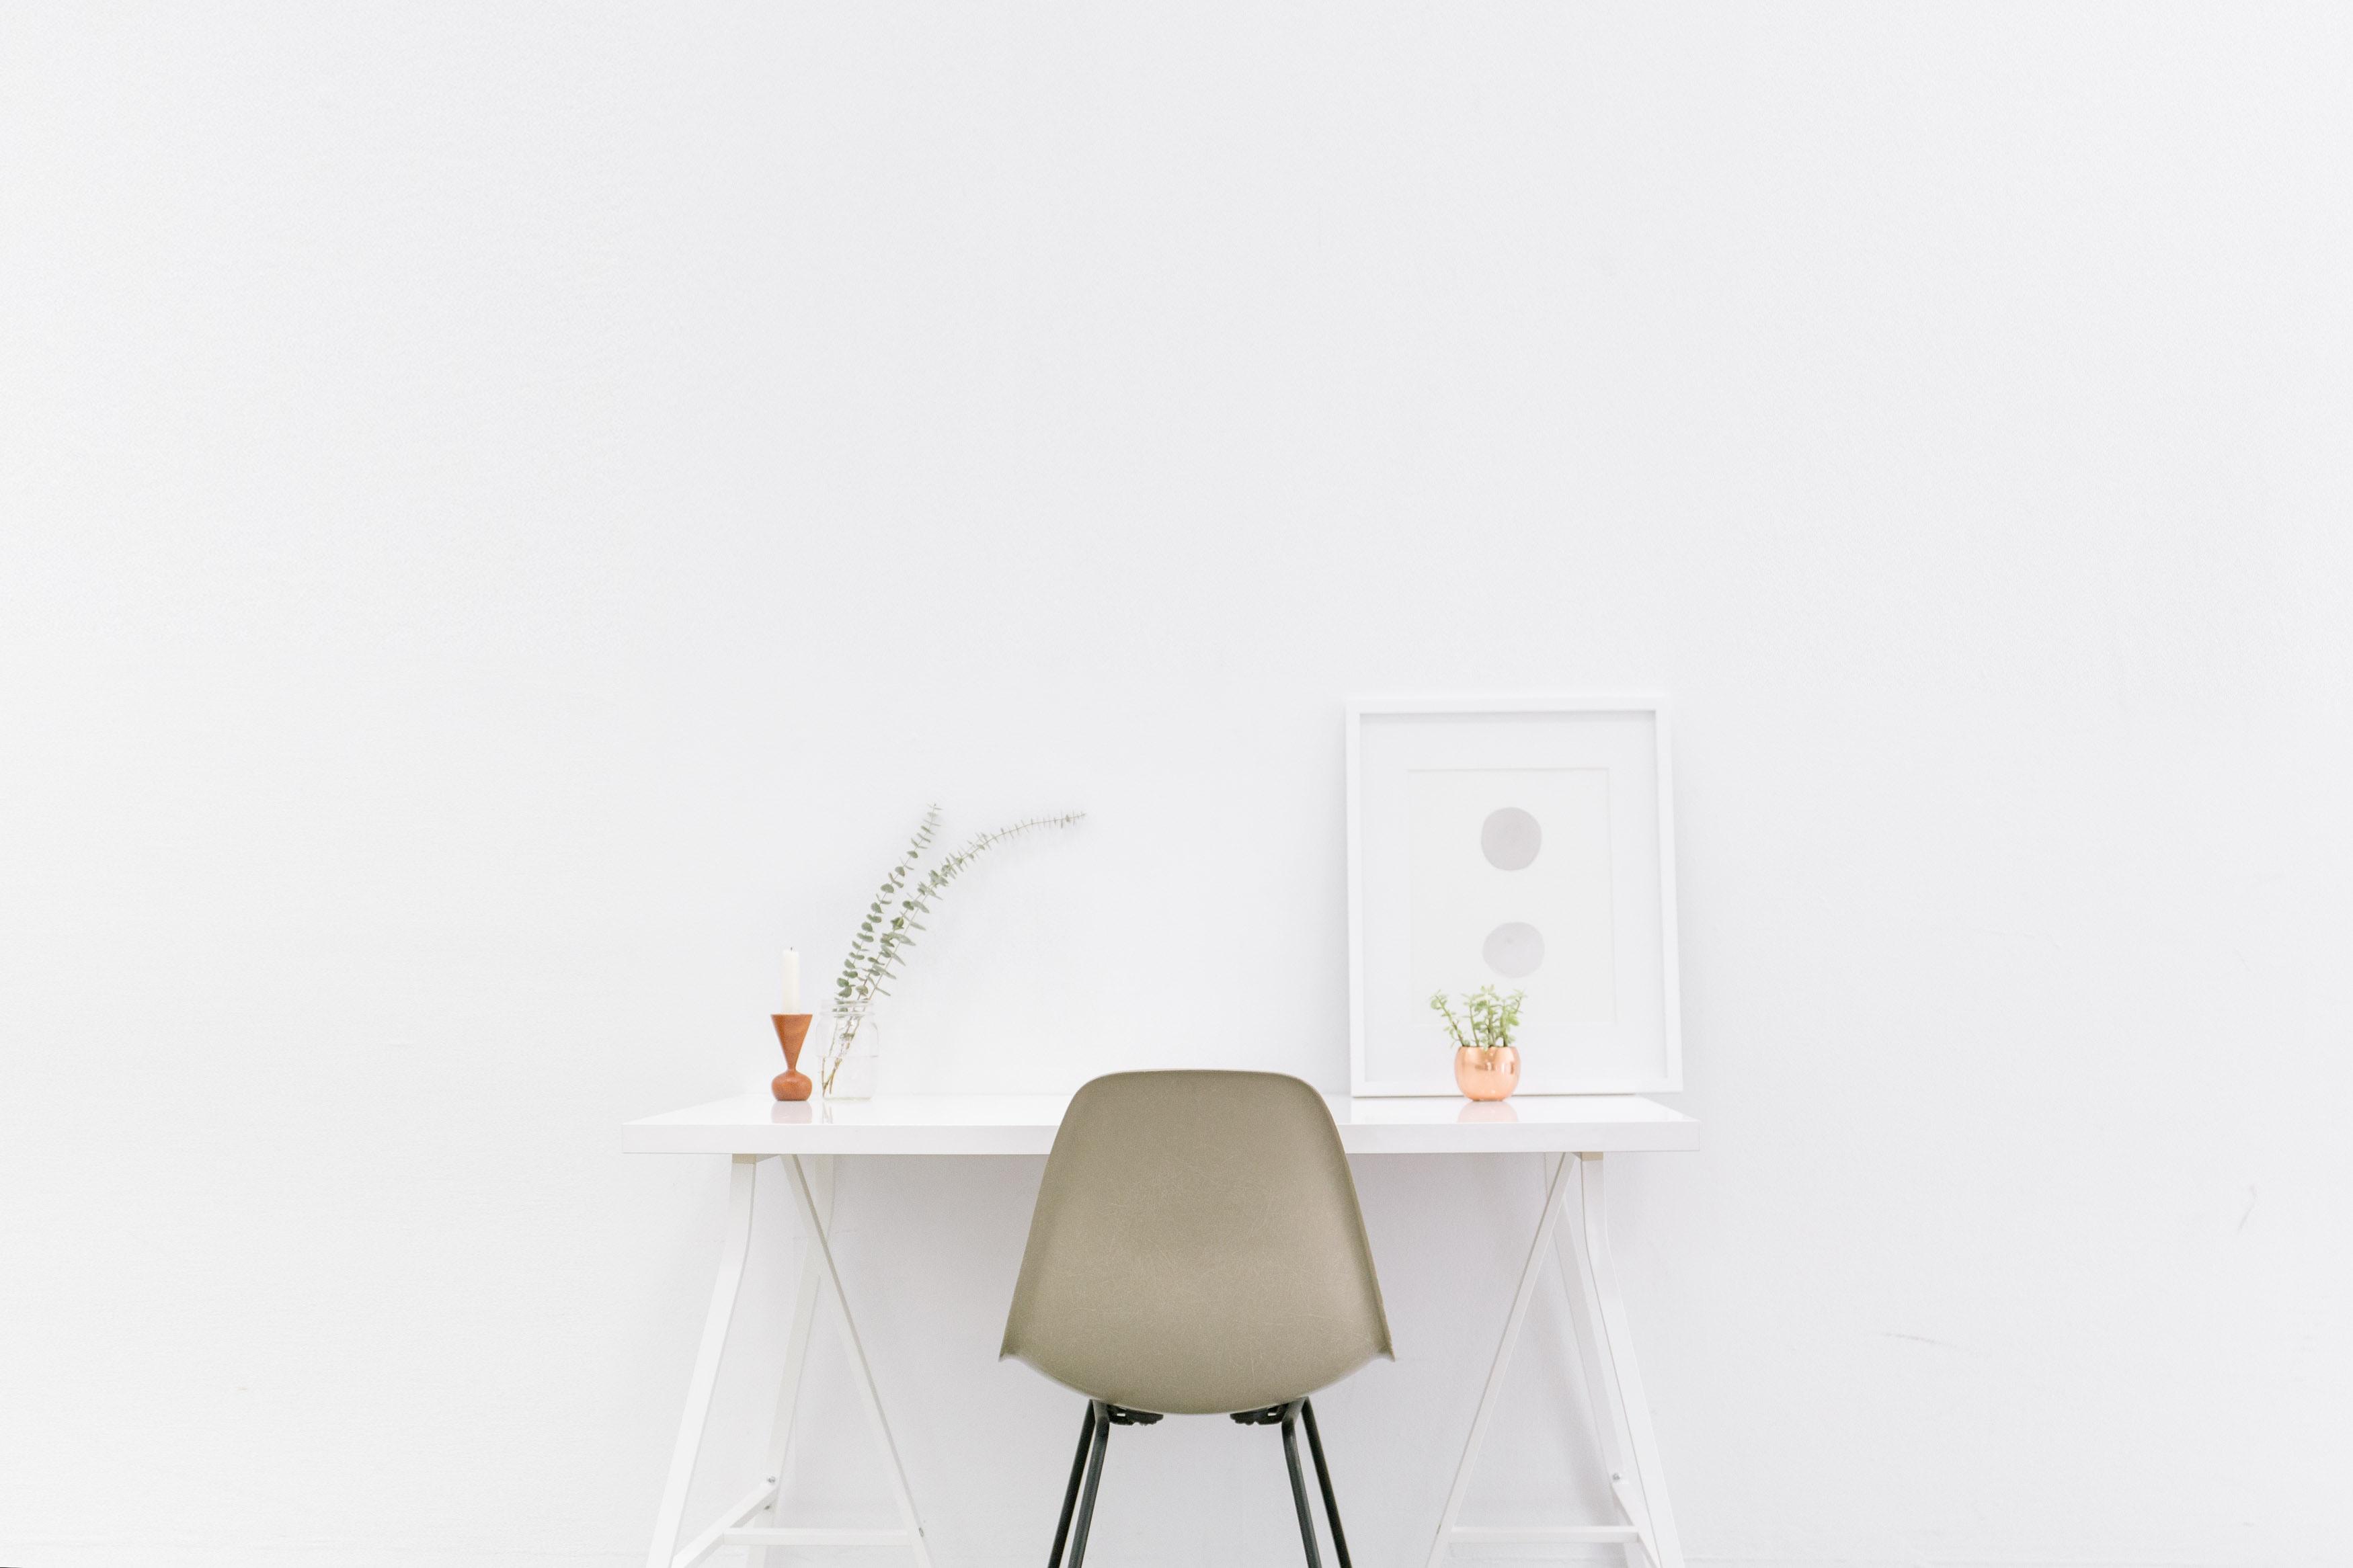 bench-accounting-49909-unsplash